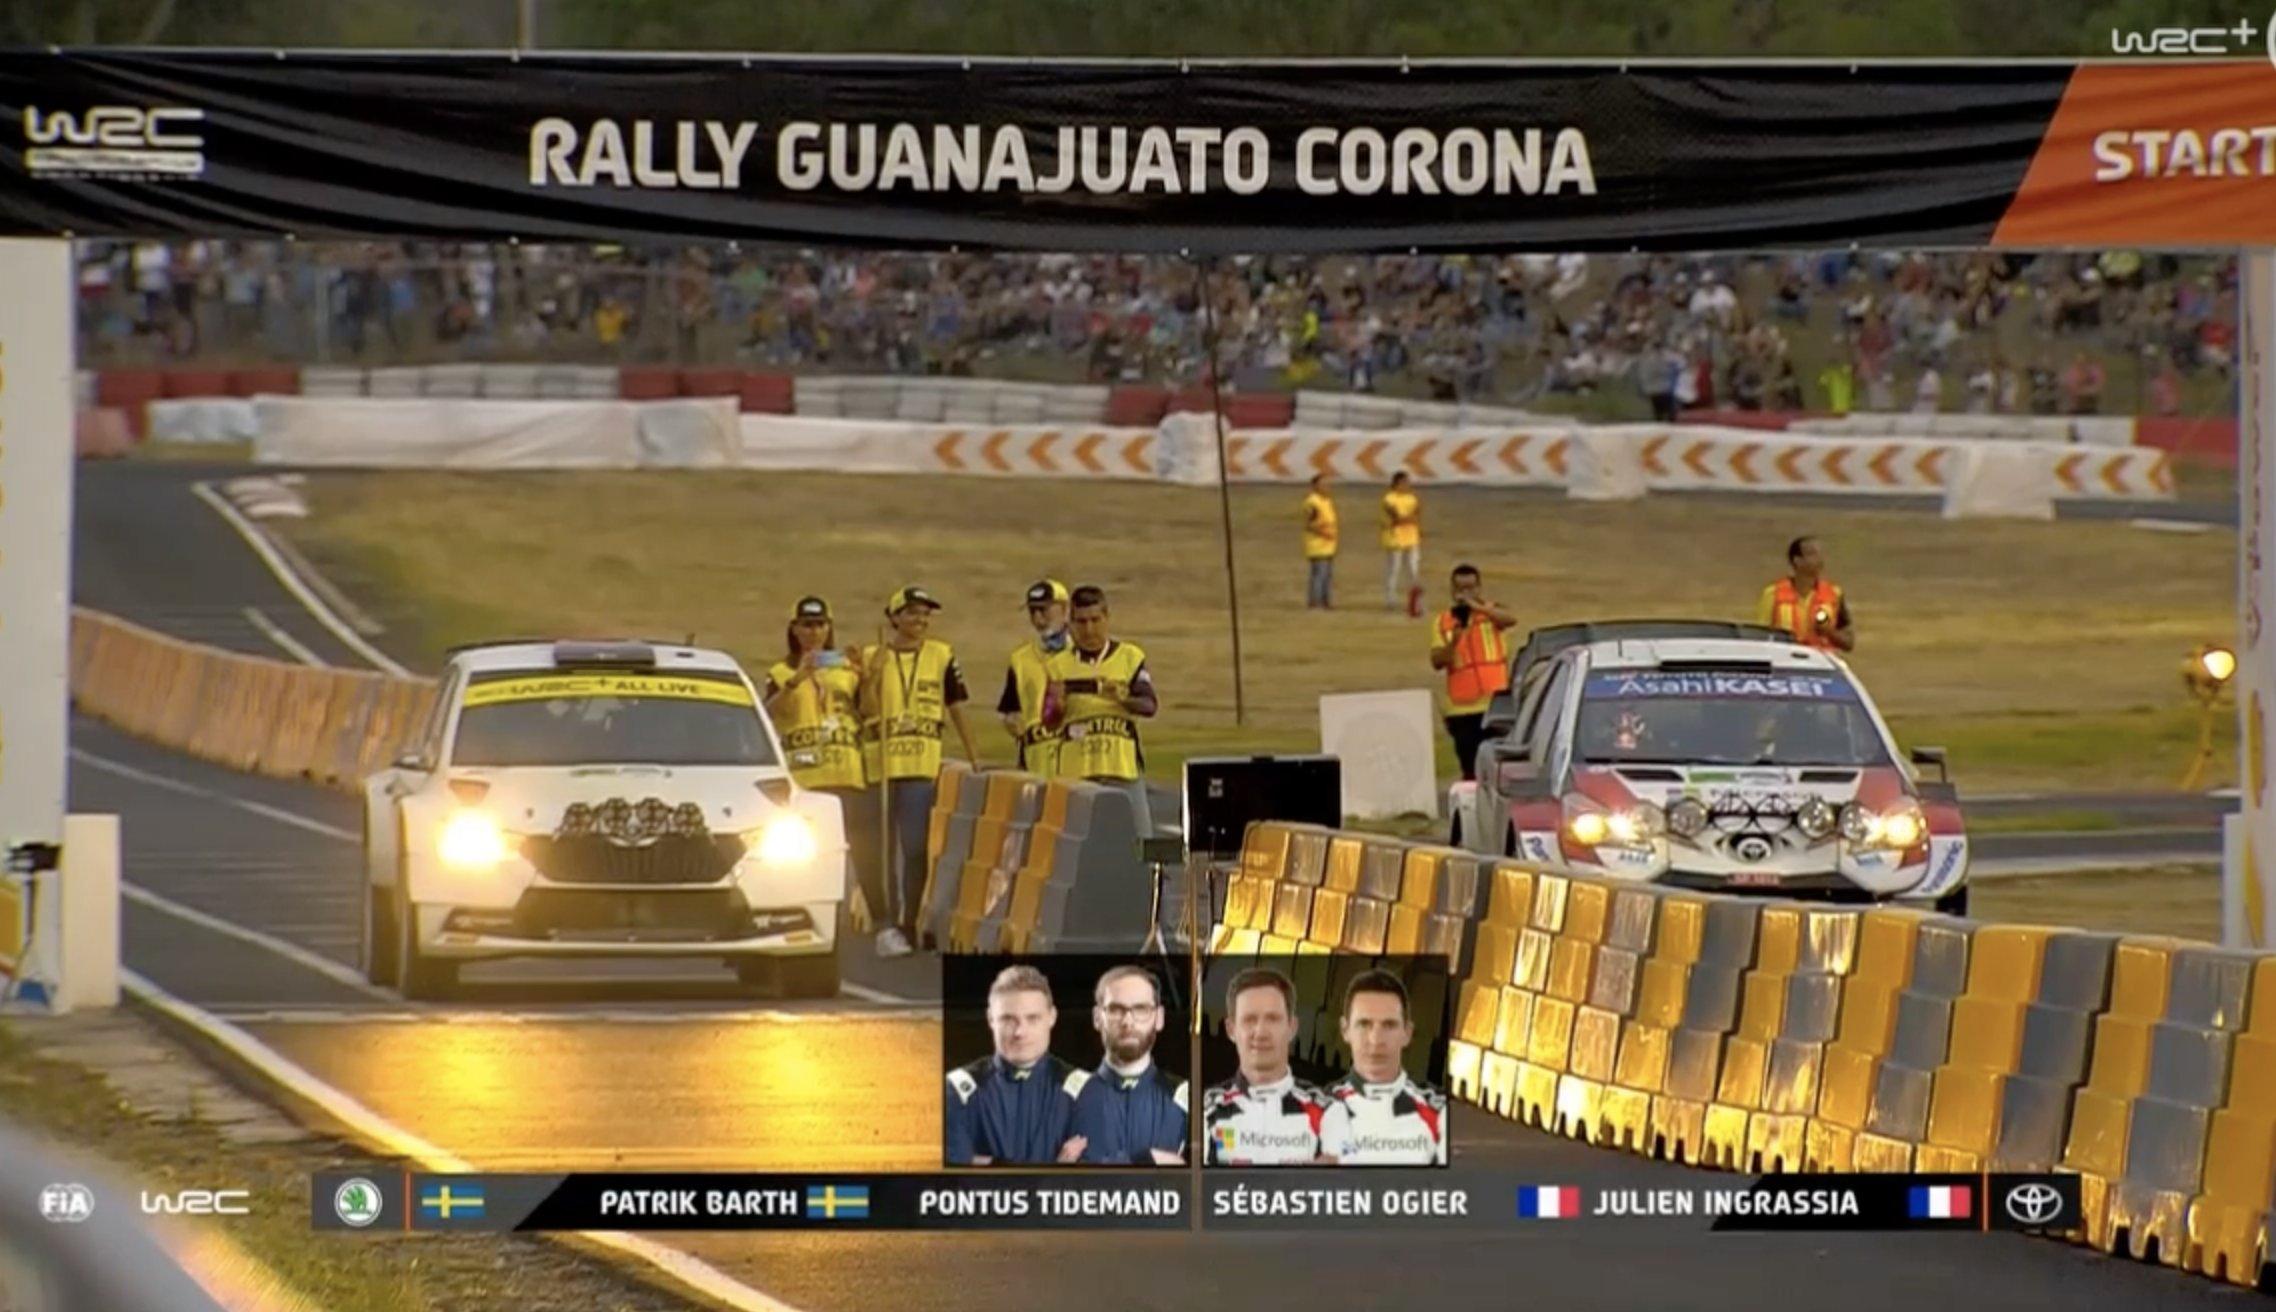 WRC: 17º Rallye Guanajuato Corona - México [12-15 Marzo] - Página 7 ETHM4W5XgAAoLoW?format=jpg&name=4096x4096